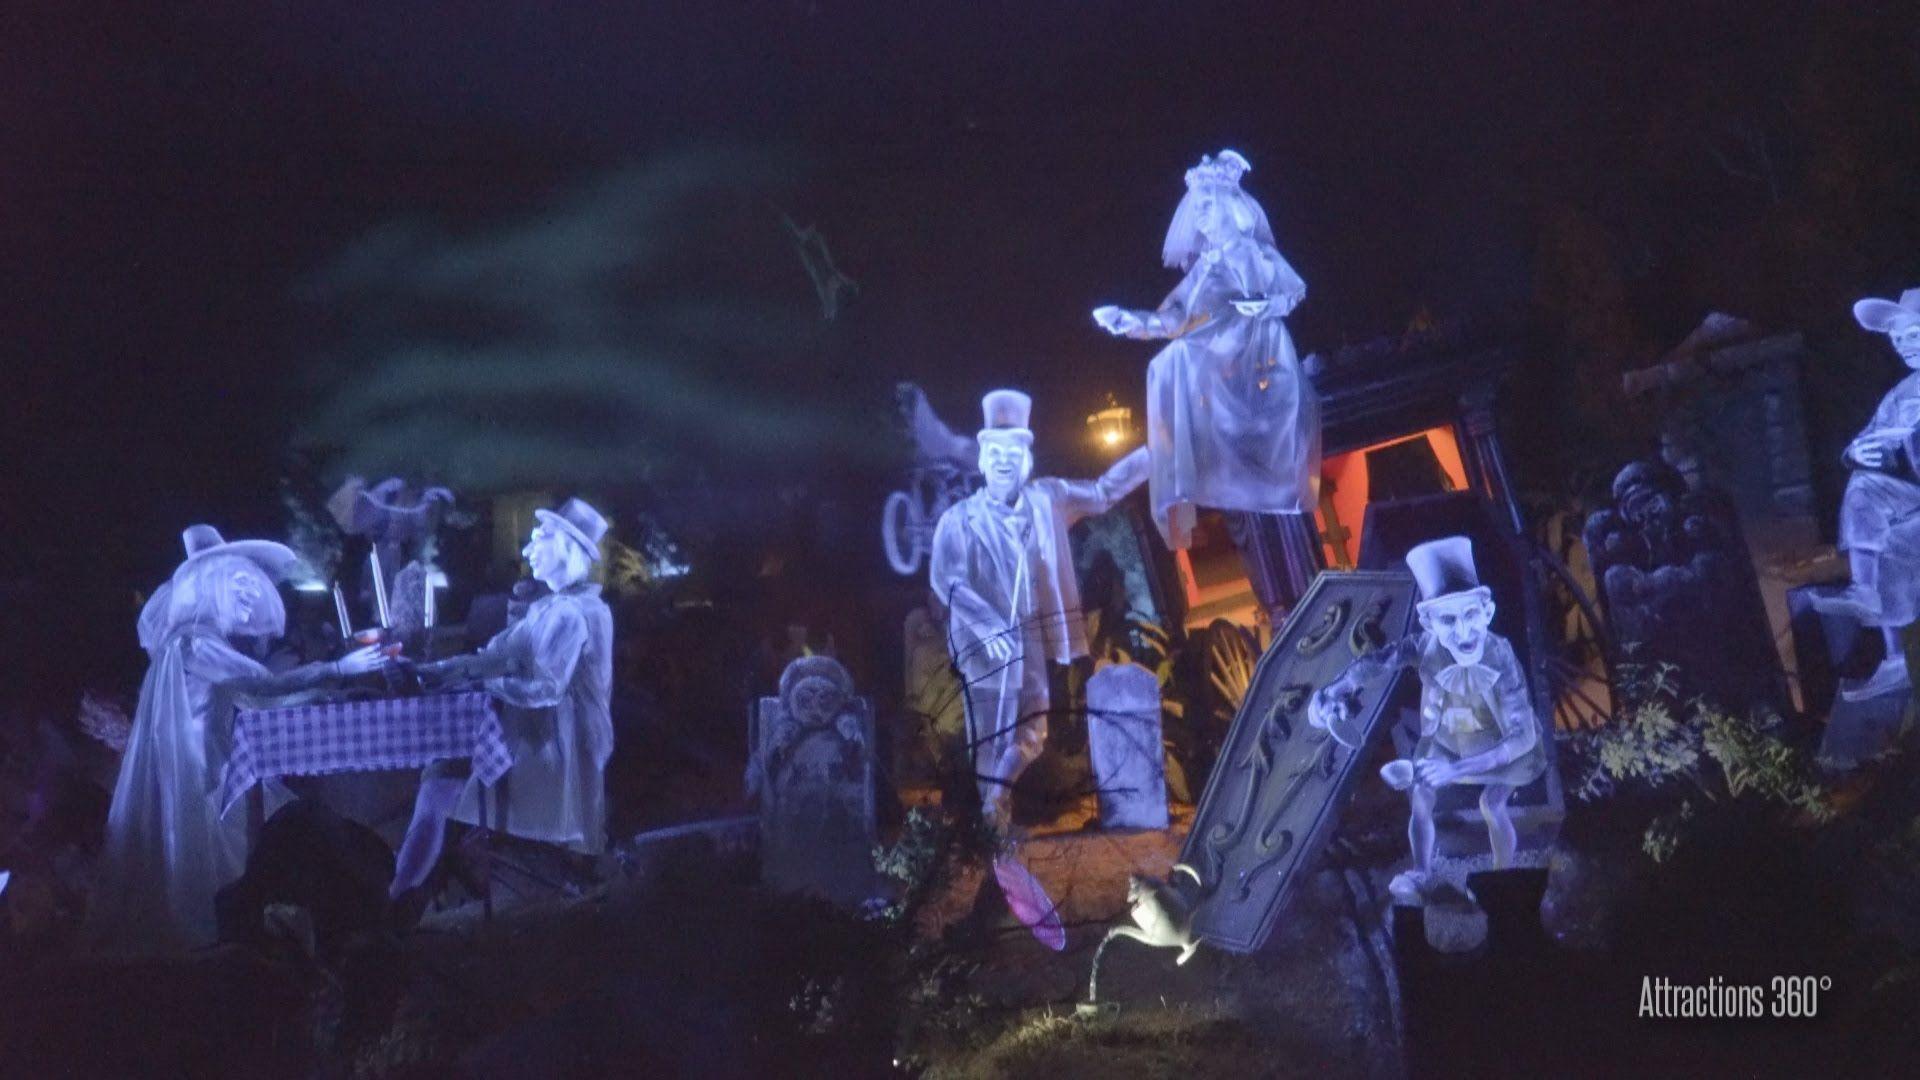 4k Tokyo Disneyland Haunted Mansion Ride 2016 Haunted Mansion Ride Haunted Mansion Disneyland Haunted Mansion